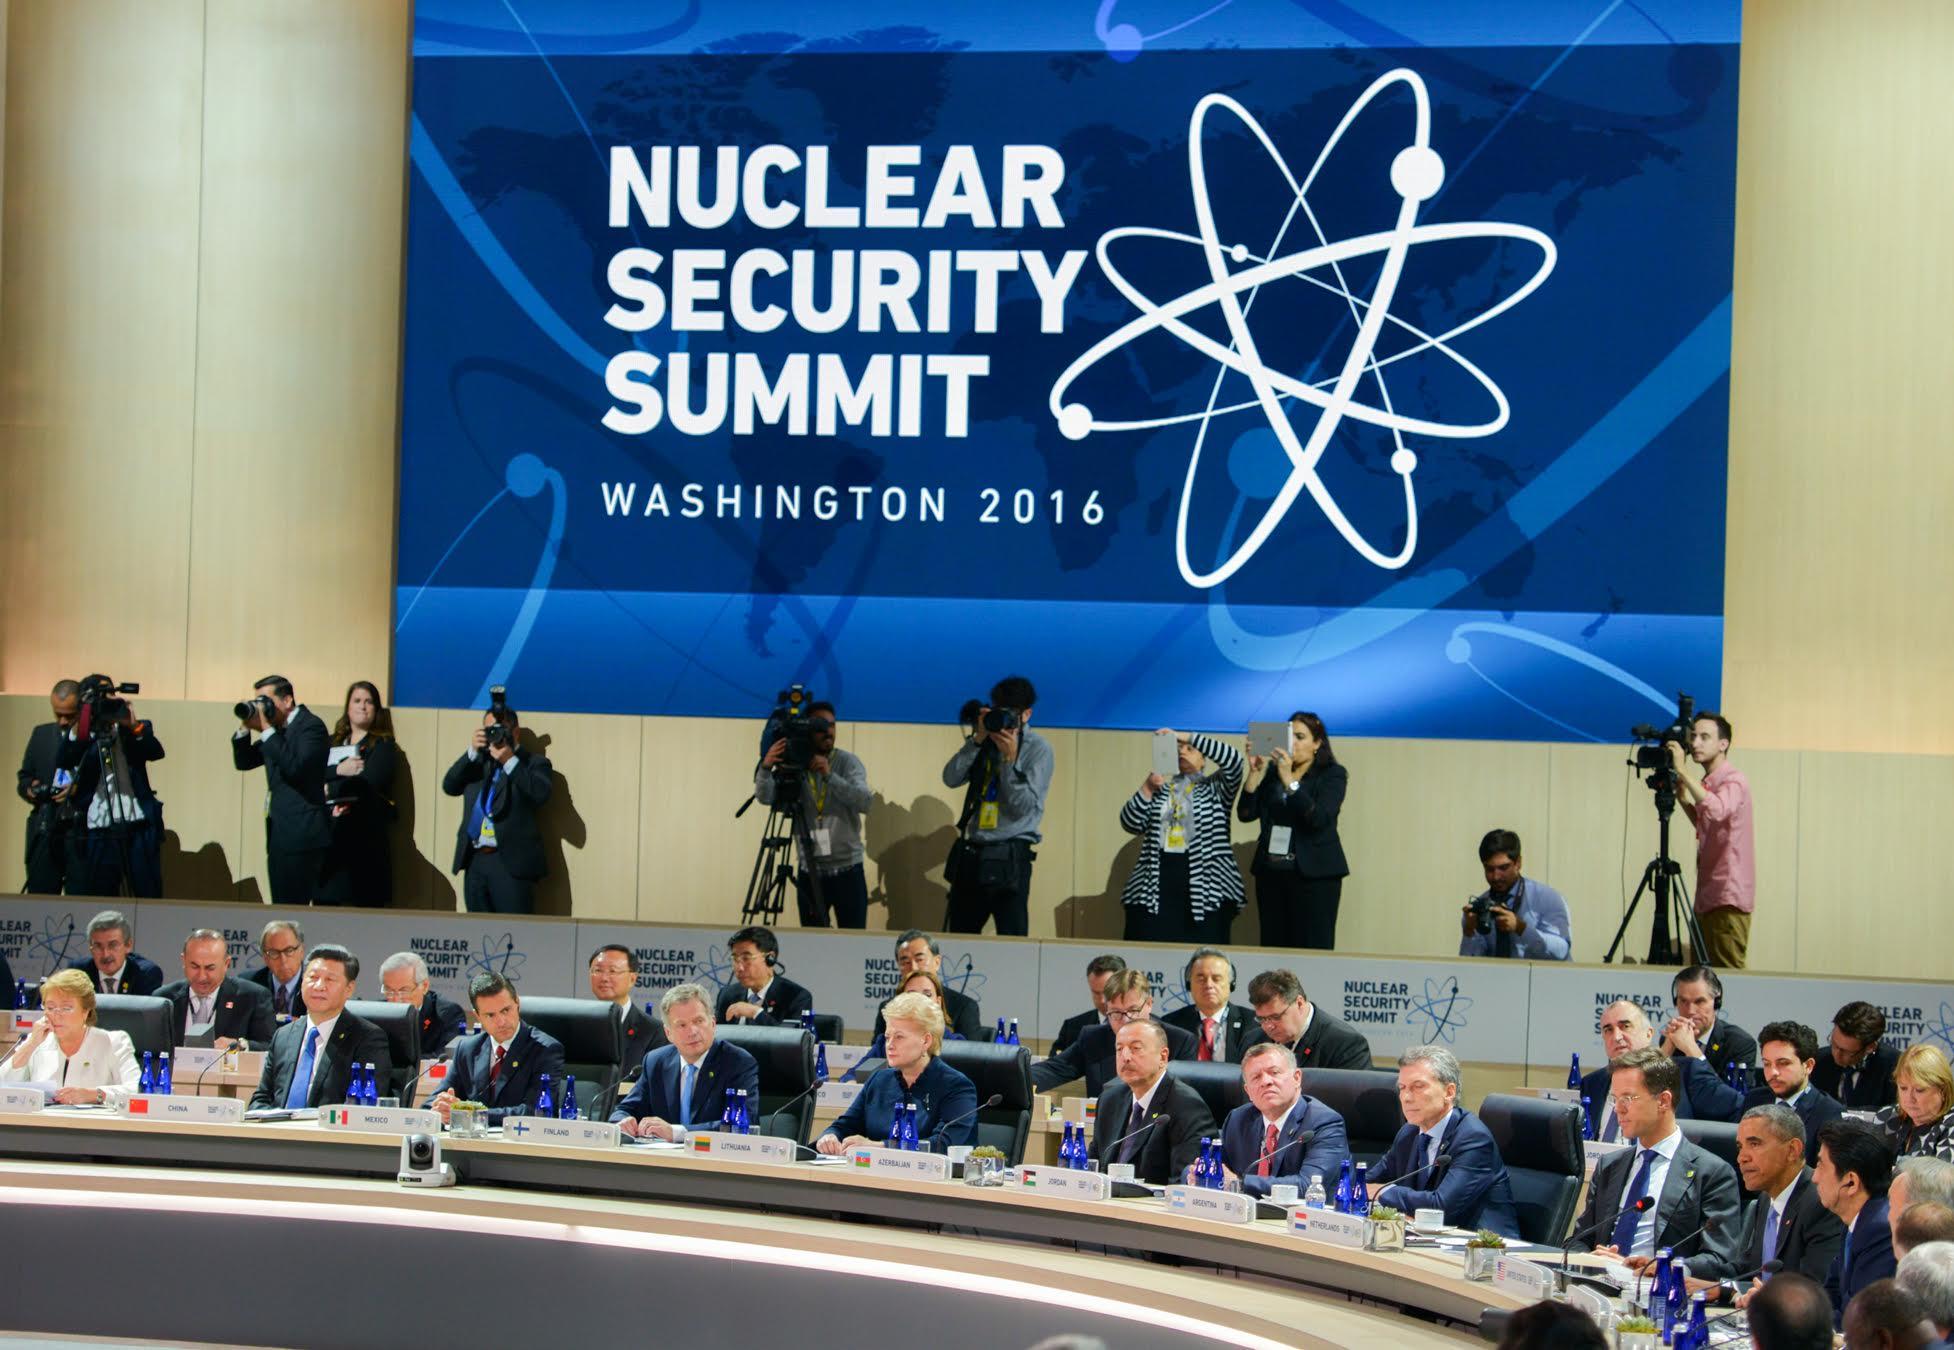 Logotipo de la cuarta Cumbre de Seguridad Nuclear 2016.